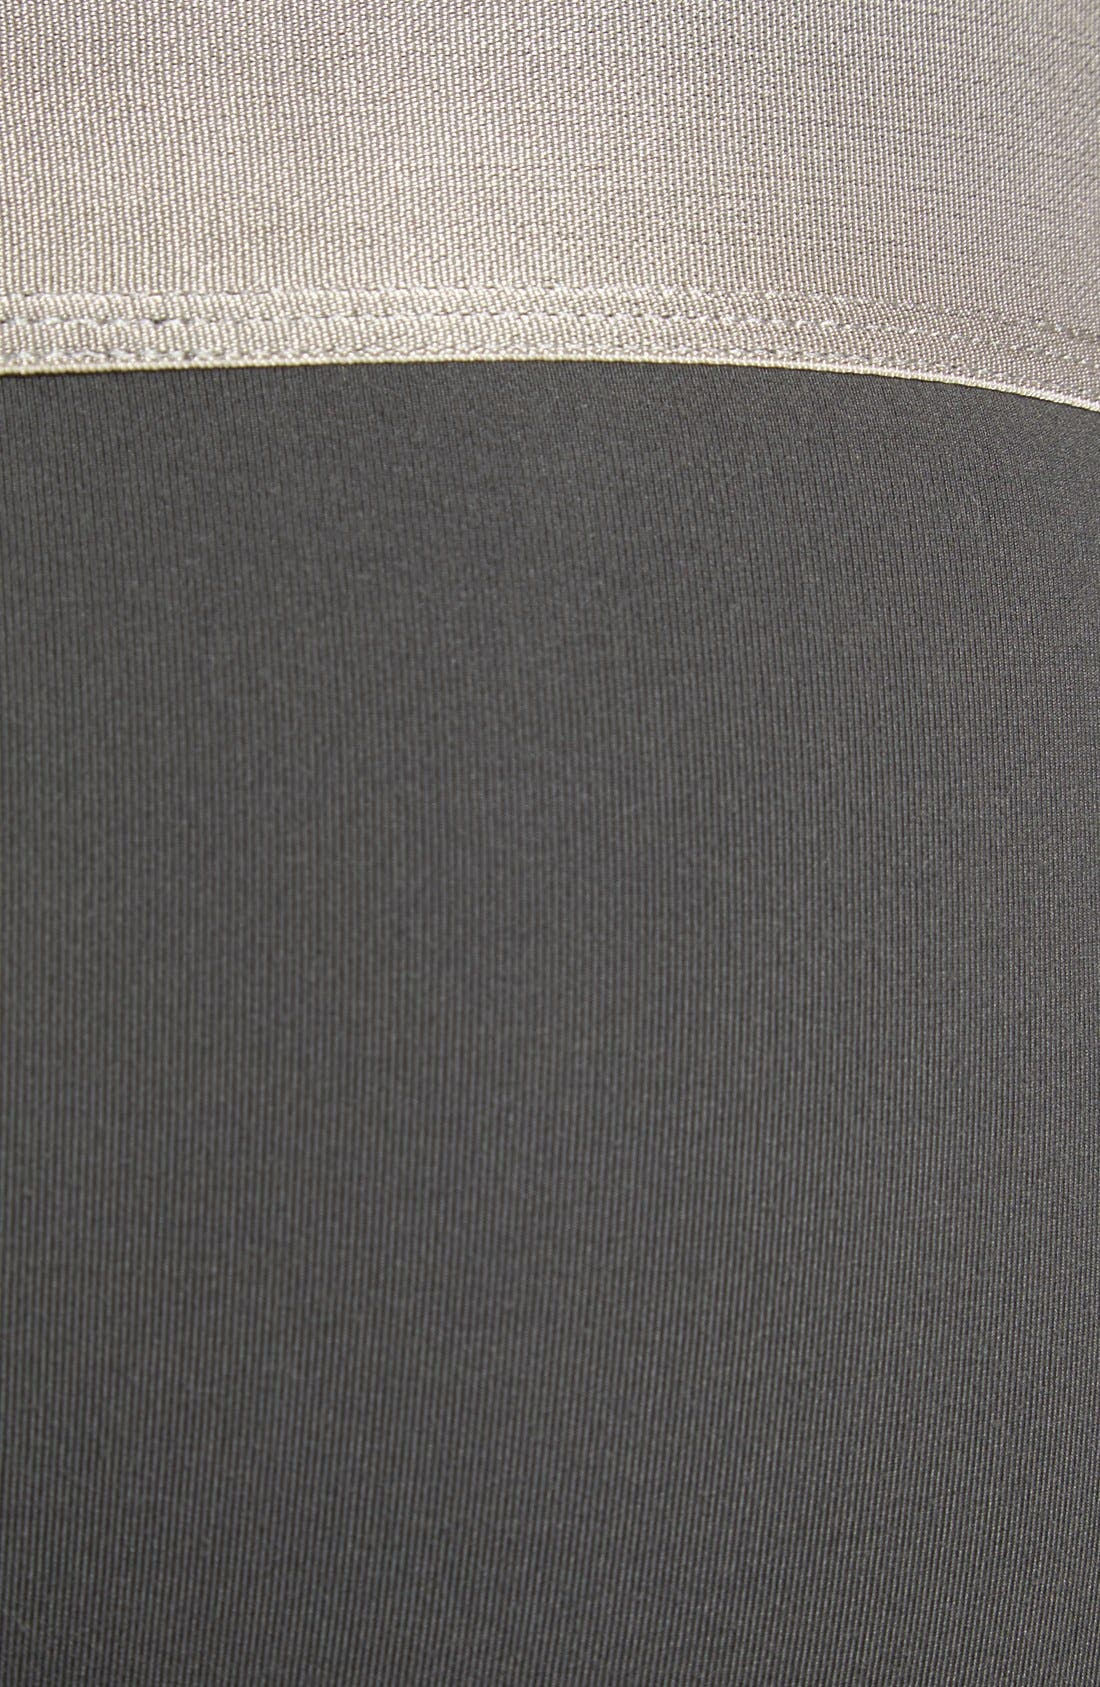 'Steel - U2715' Microfiber Hip Briefs,                             Alternate thumbnail 82, color,